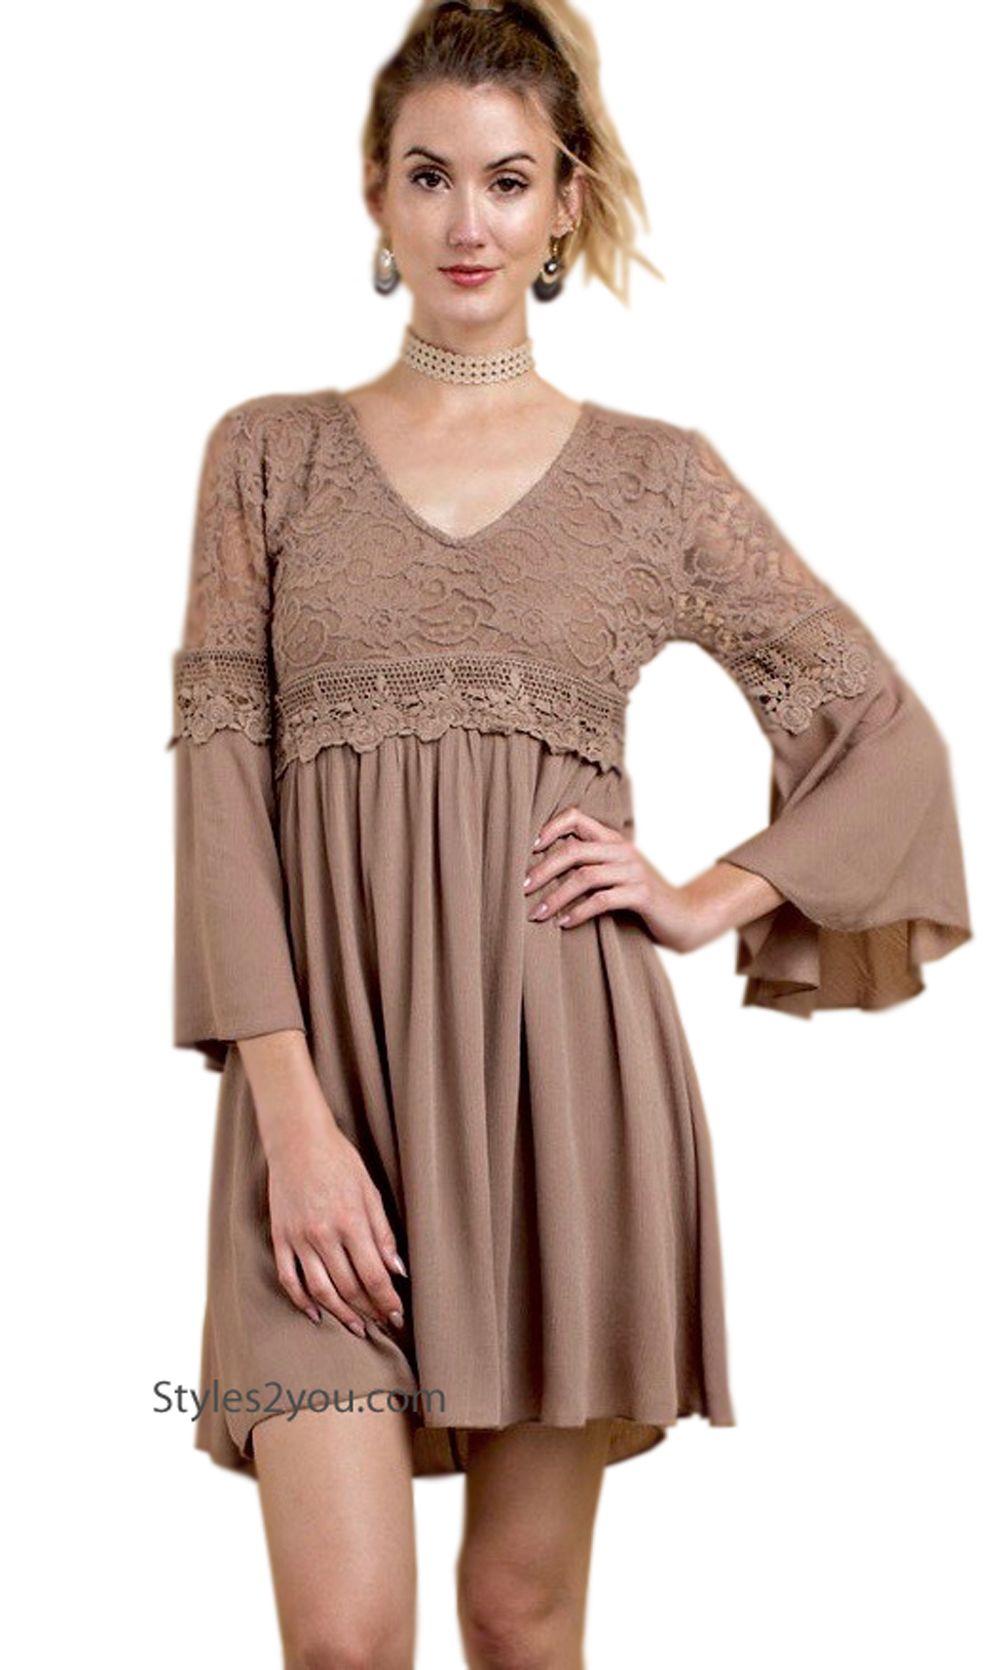 2940f886a1305 Lace Dress Extender Amazon - raveitsafe